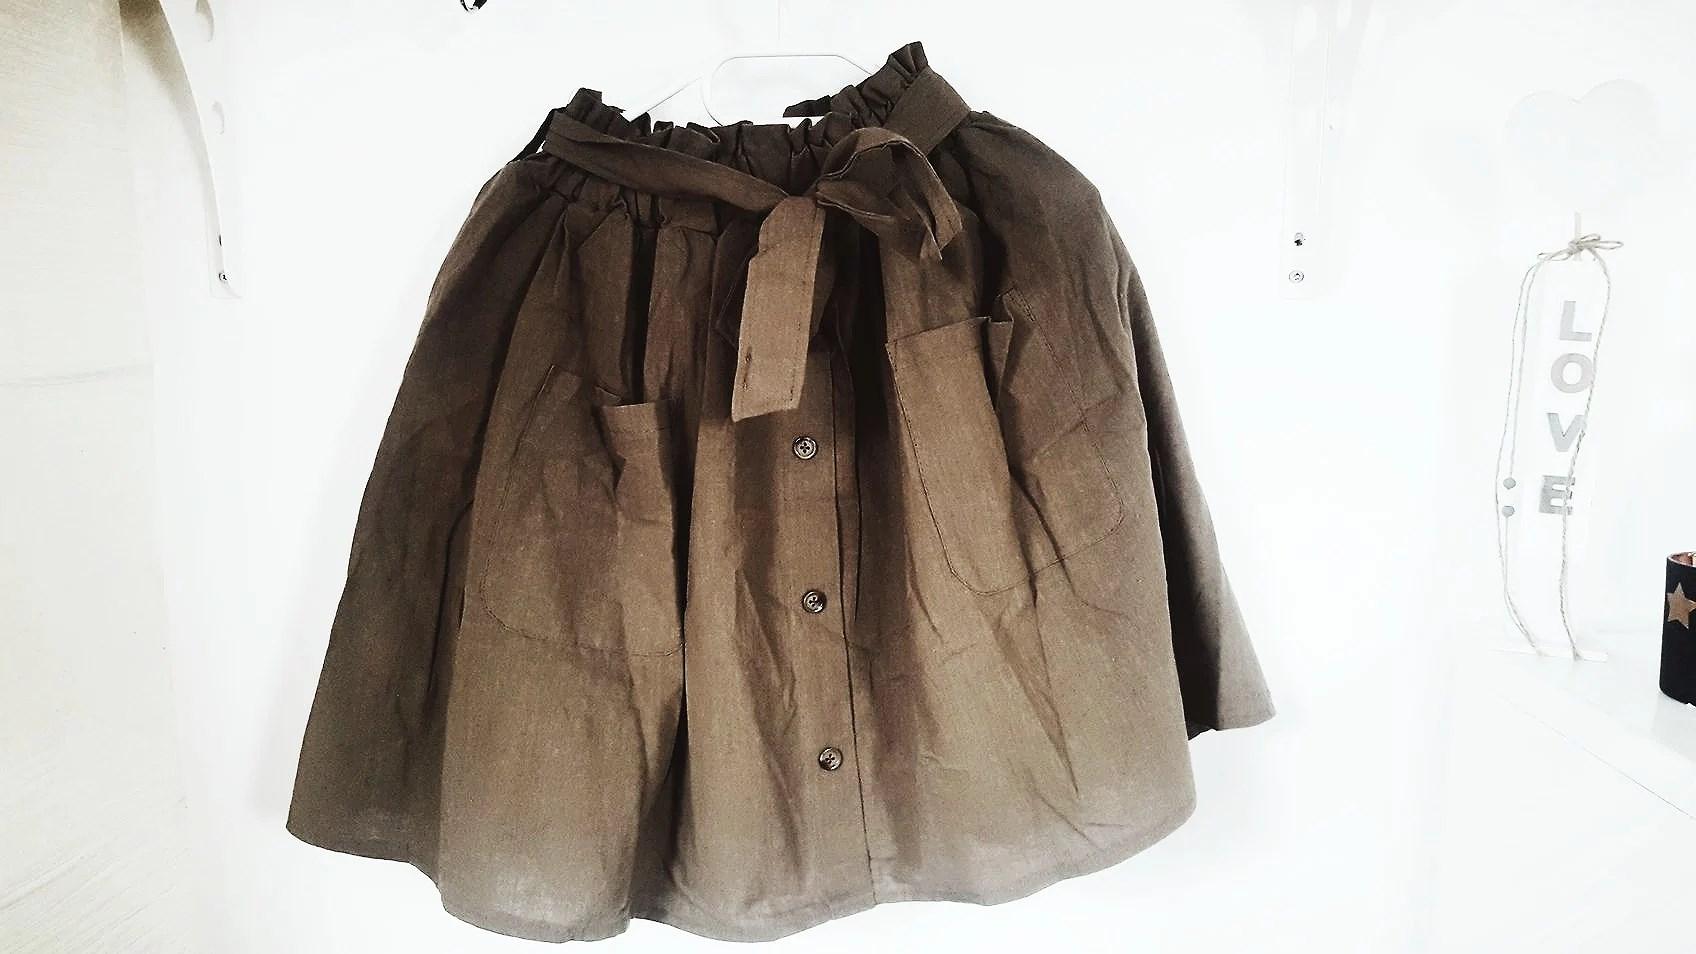 romwe, skirt, khaki, fashion, haul, nowości,